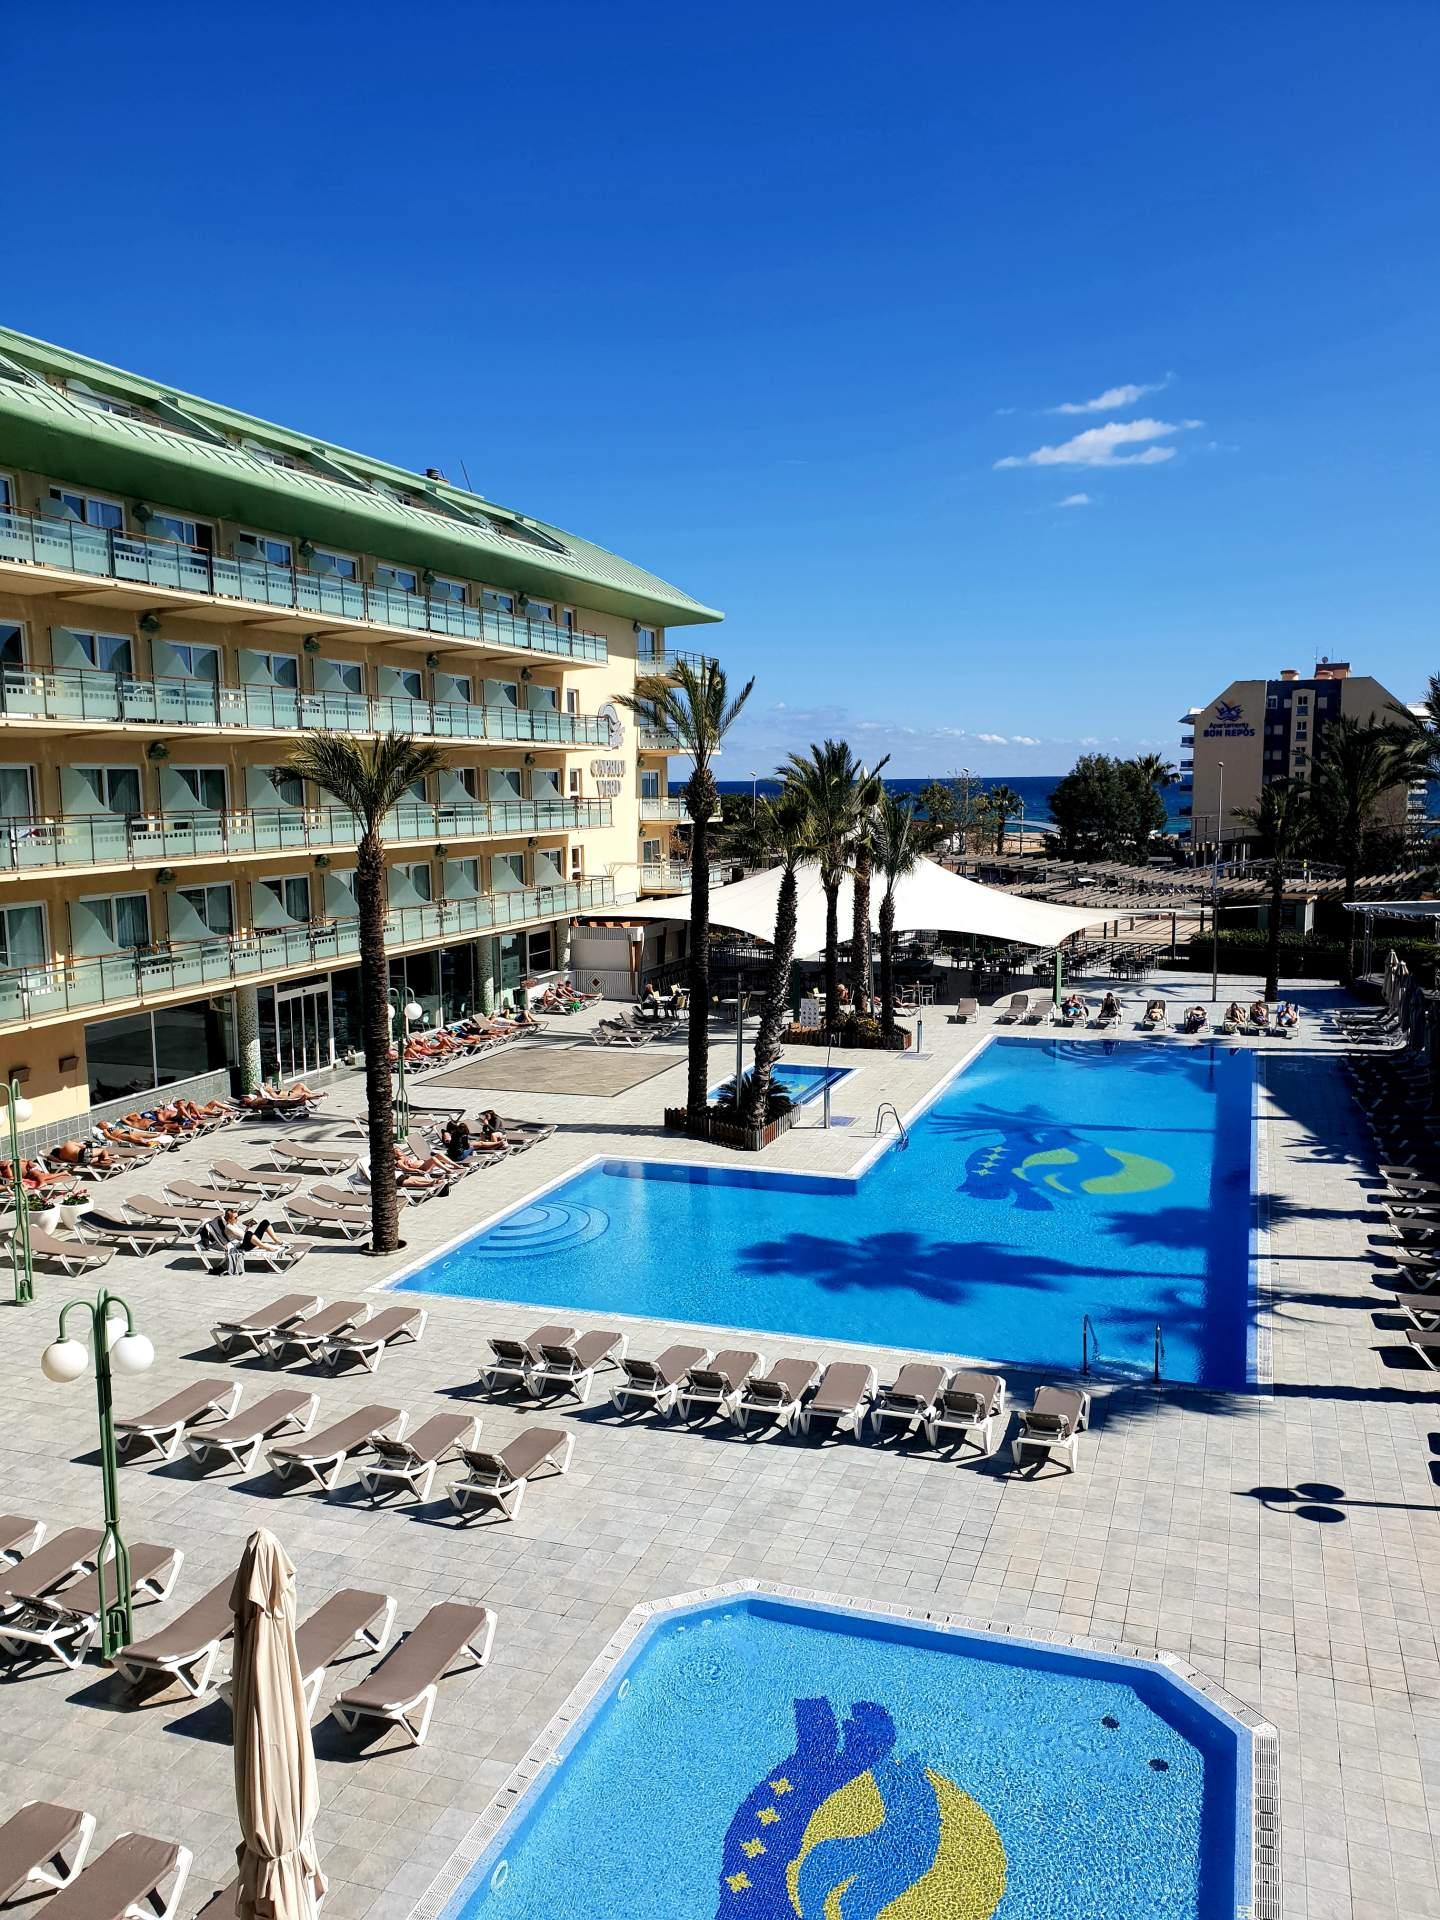 Busreis strandvakantie Santa Susanna hotel Alegria Caprici Verd